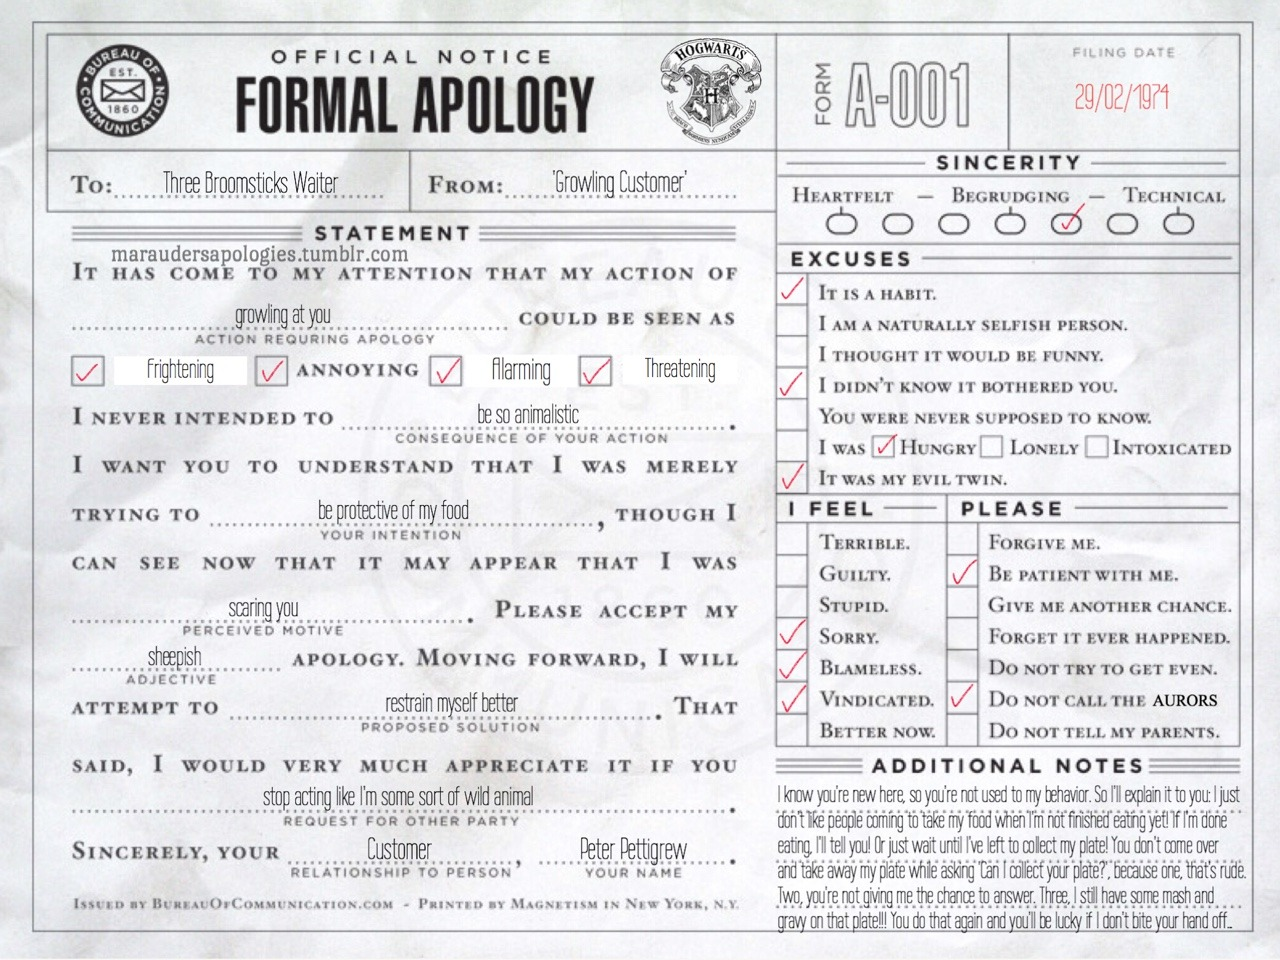 Marauders Apologies